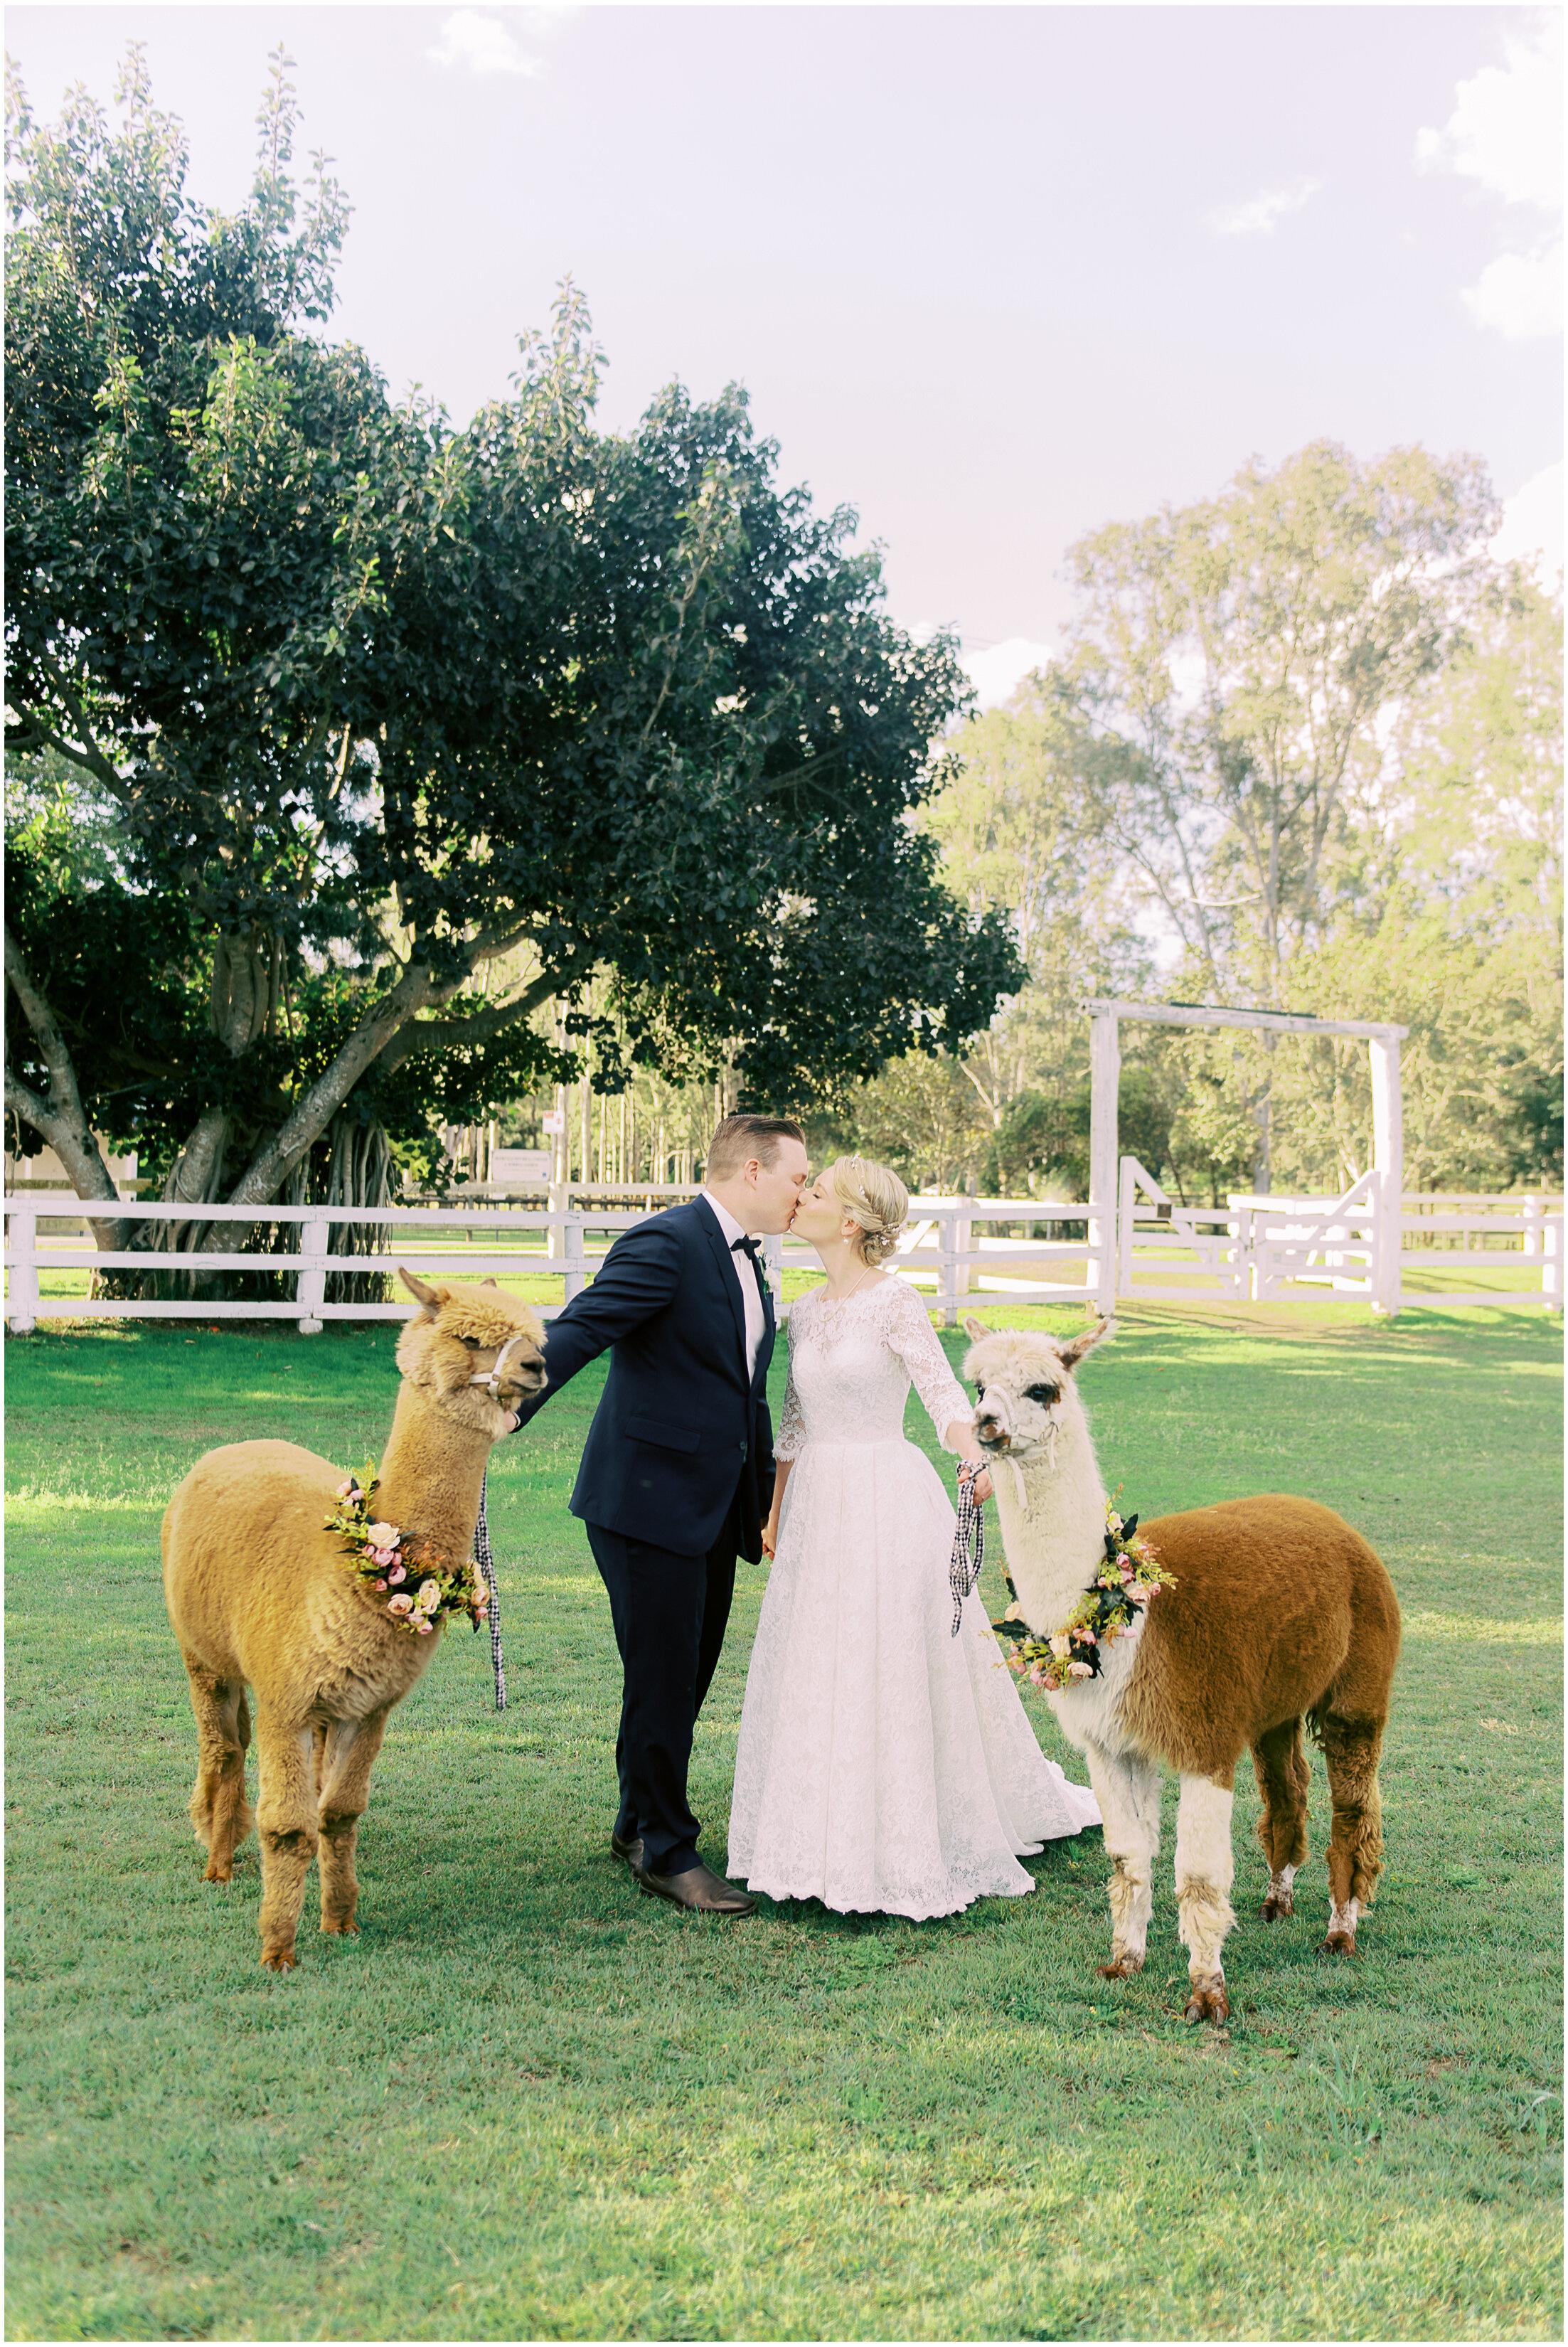 brisbane-fine-art-wedding-photographer-lauren-olivia-luxury-wedding-australia-15.jpg